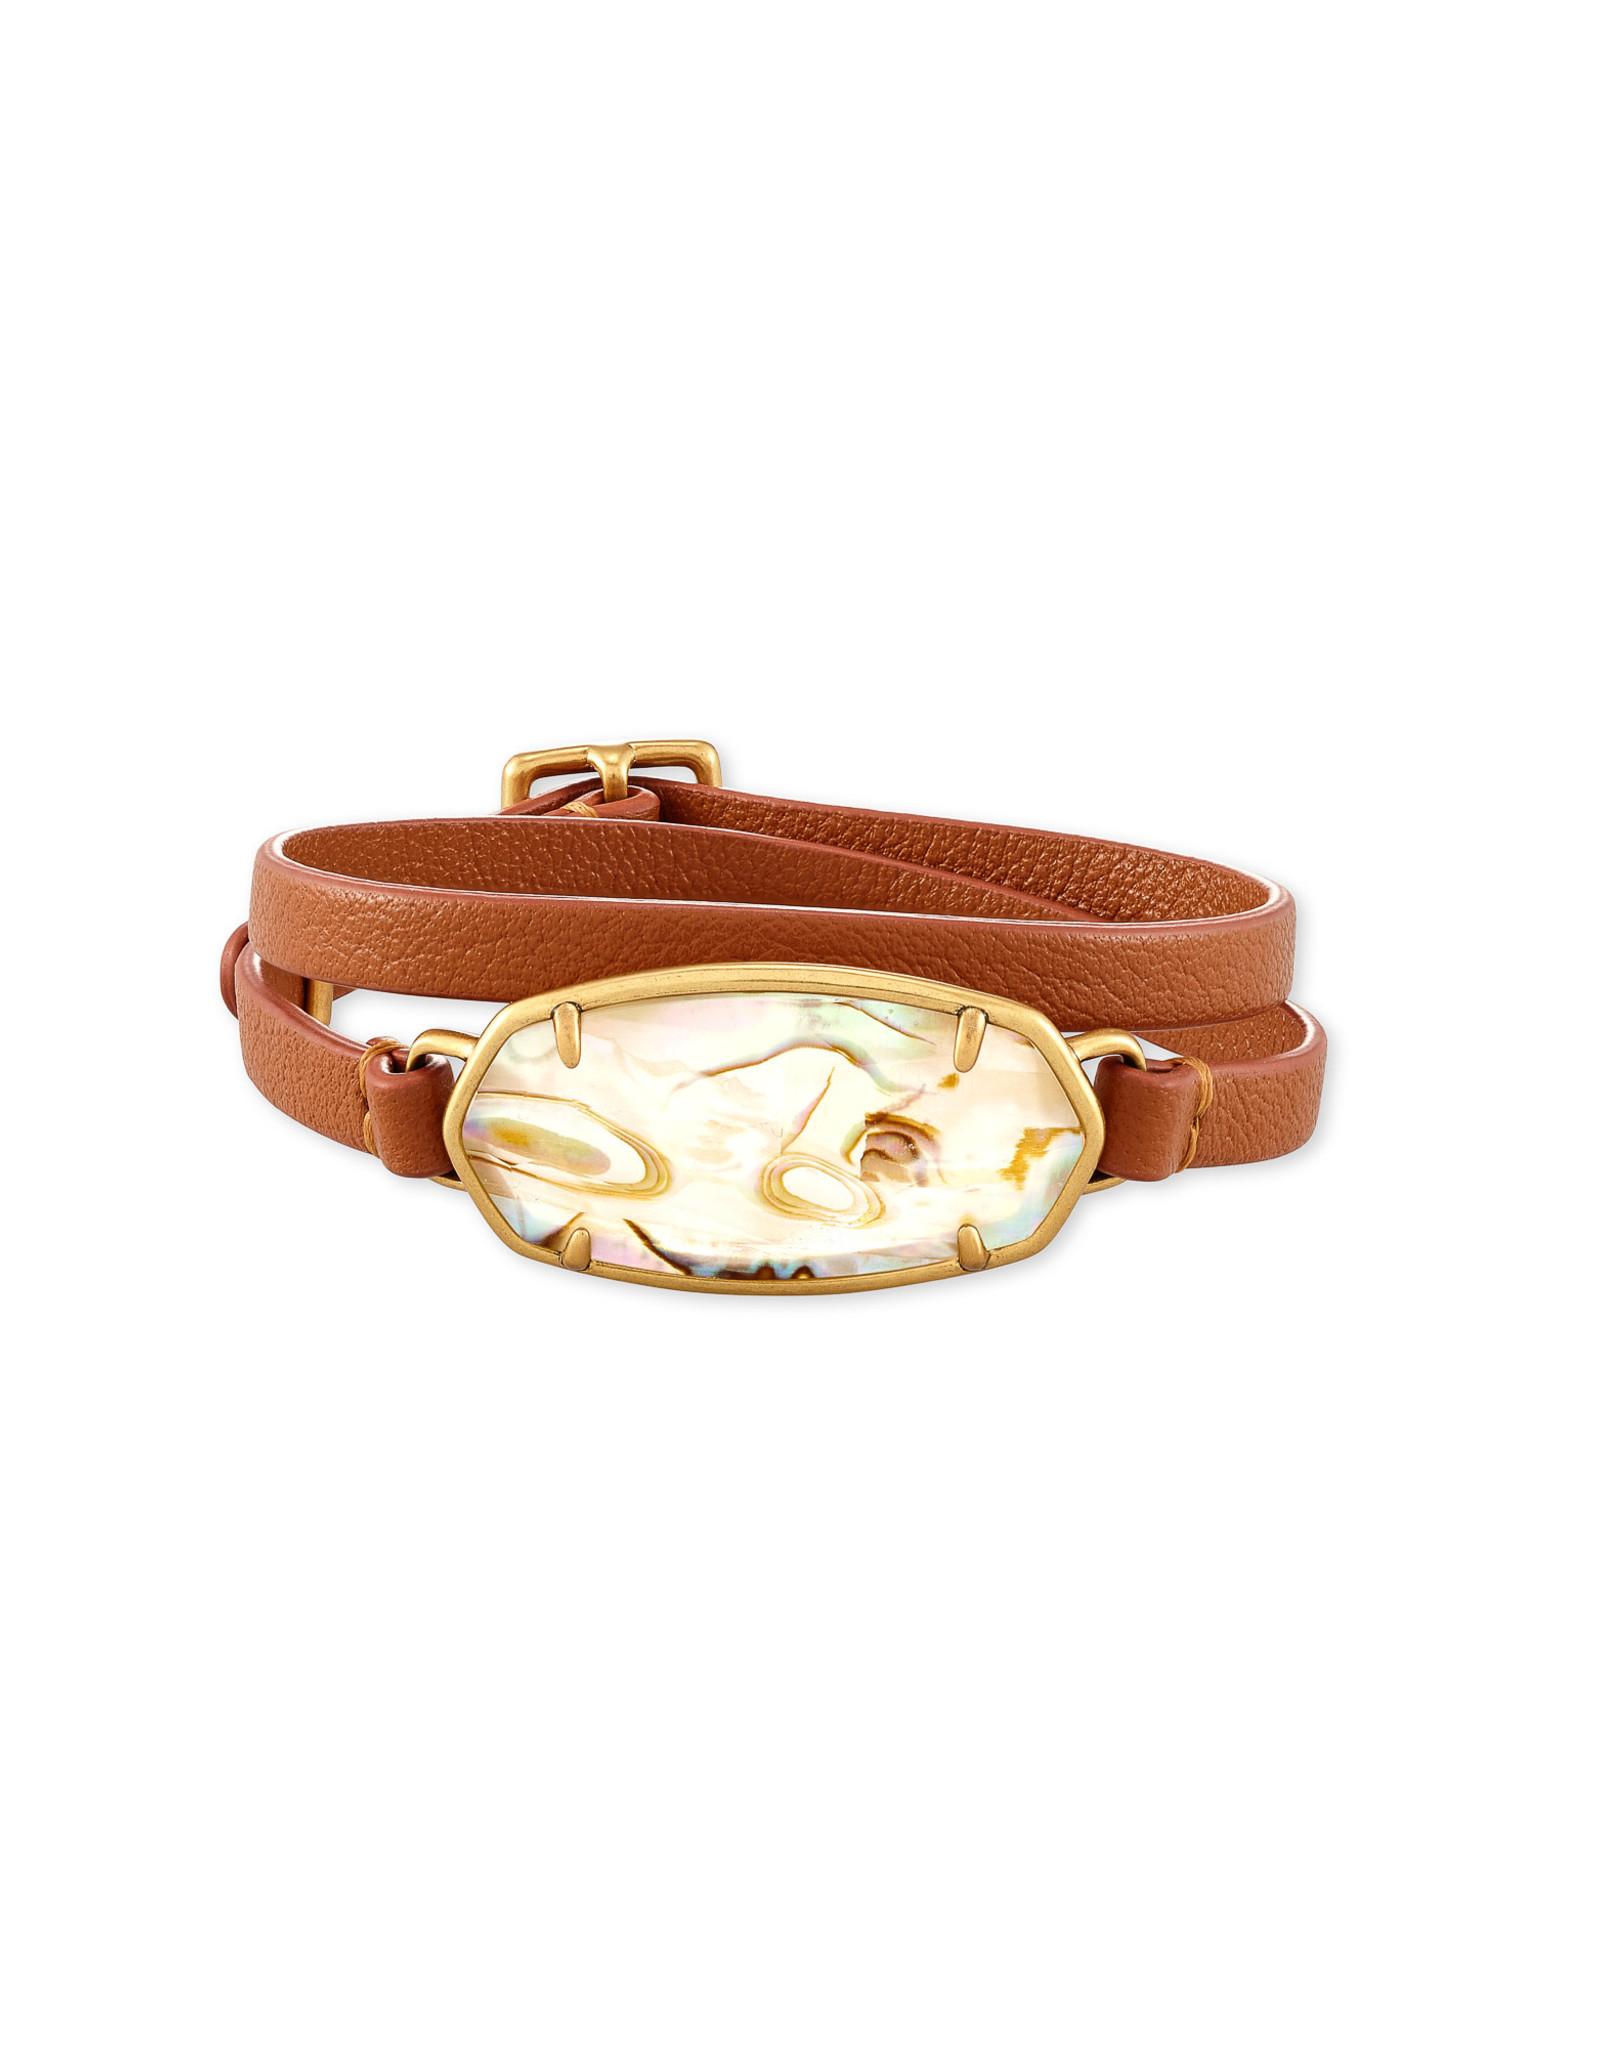 Kendra Scott Elle Leather Wrap Bracelet - White Abalone/Vintage Gold